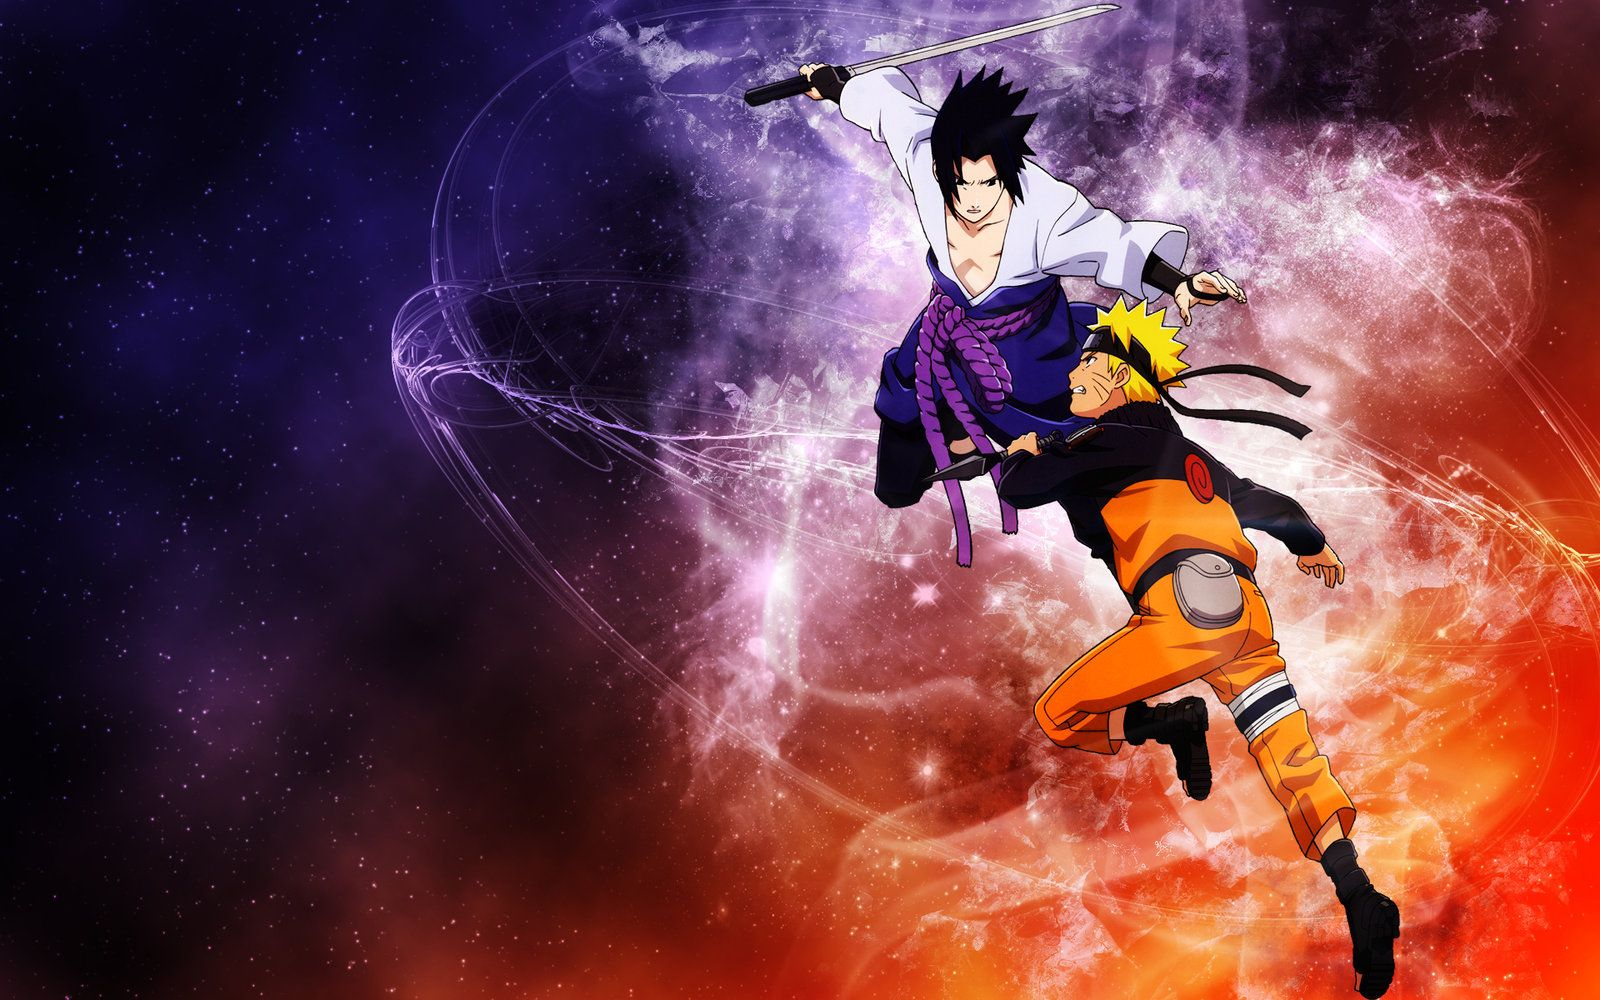 Popular Wallpaper Naruto Halloween - b462425e7599b415b7714636e2f26868  Snapshot_567823.jpg